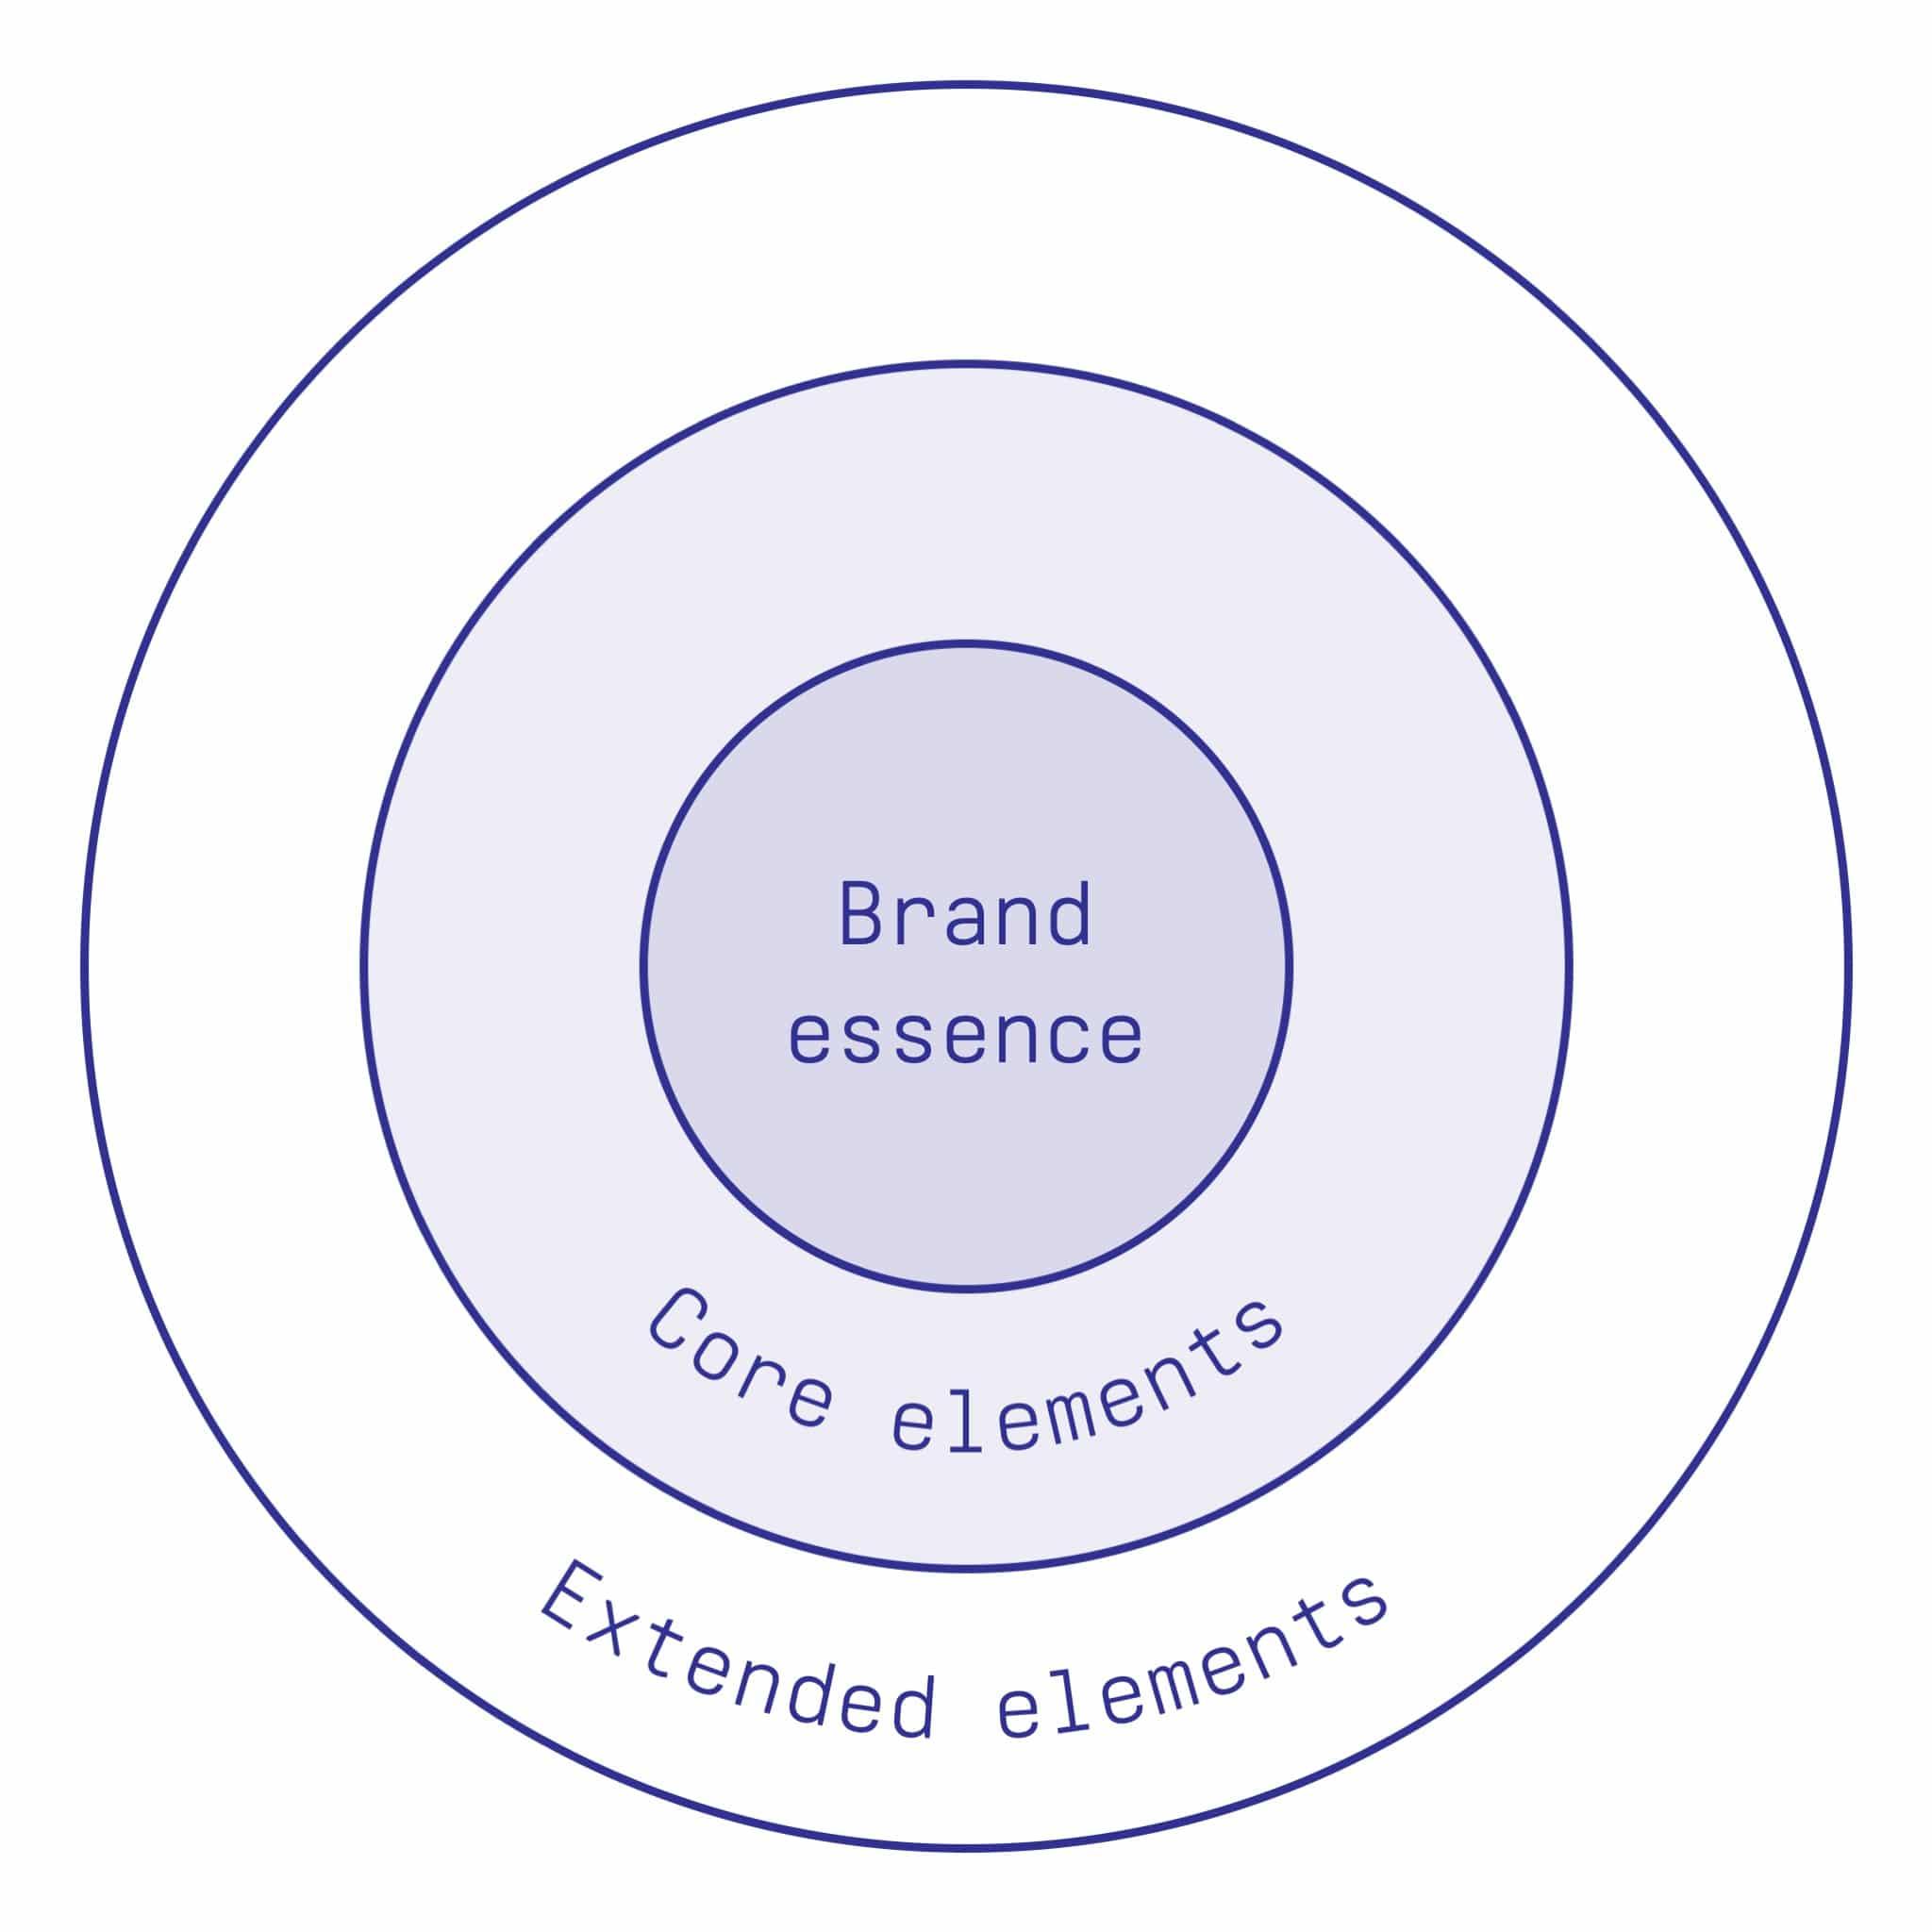 David Aaker's Brand Vision Model